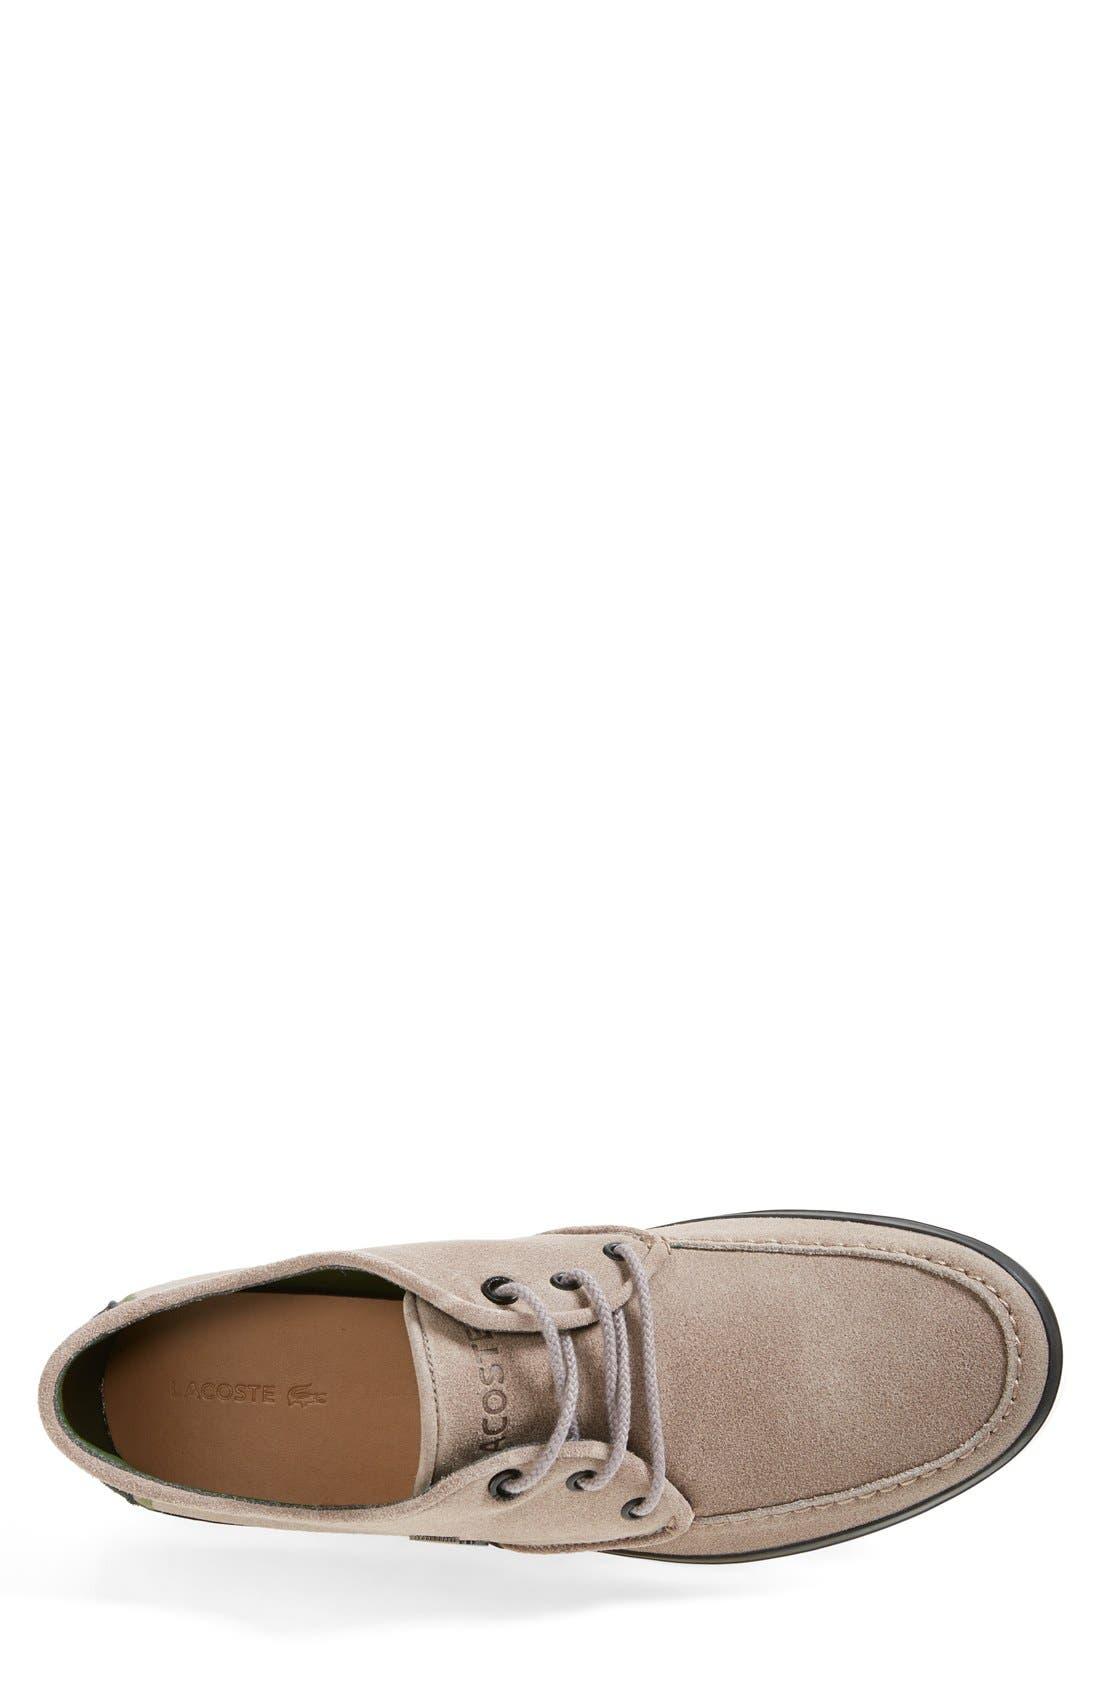 Alternate Image 3  - Lacoste 'Sevrin 4' Sneaker (Men) (Online Only)